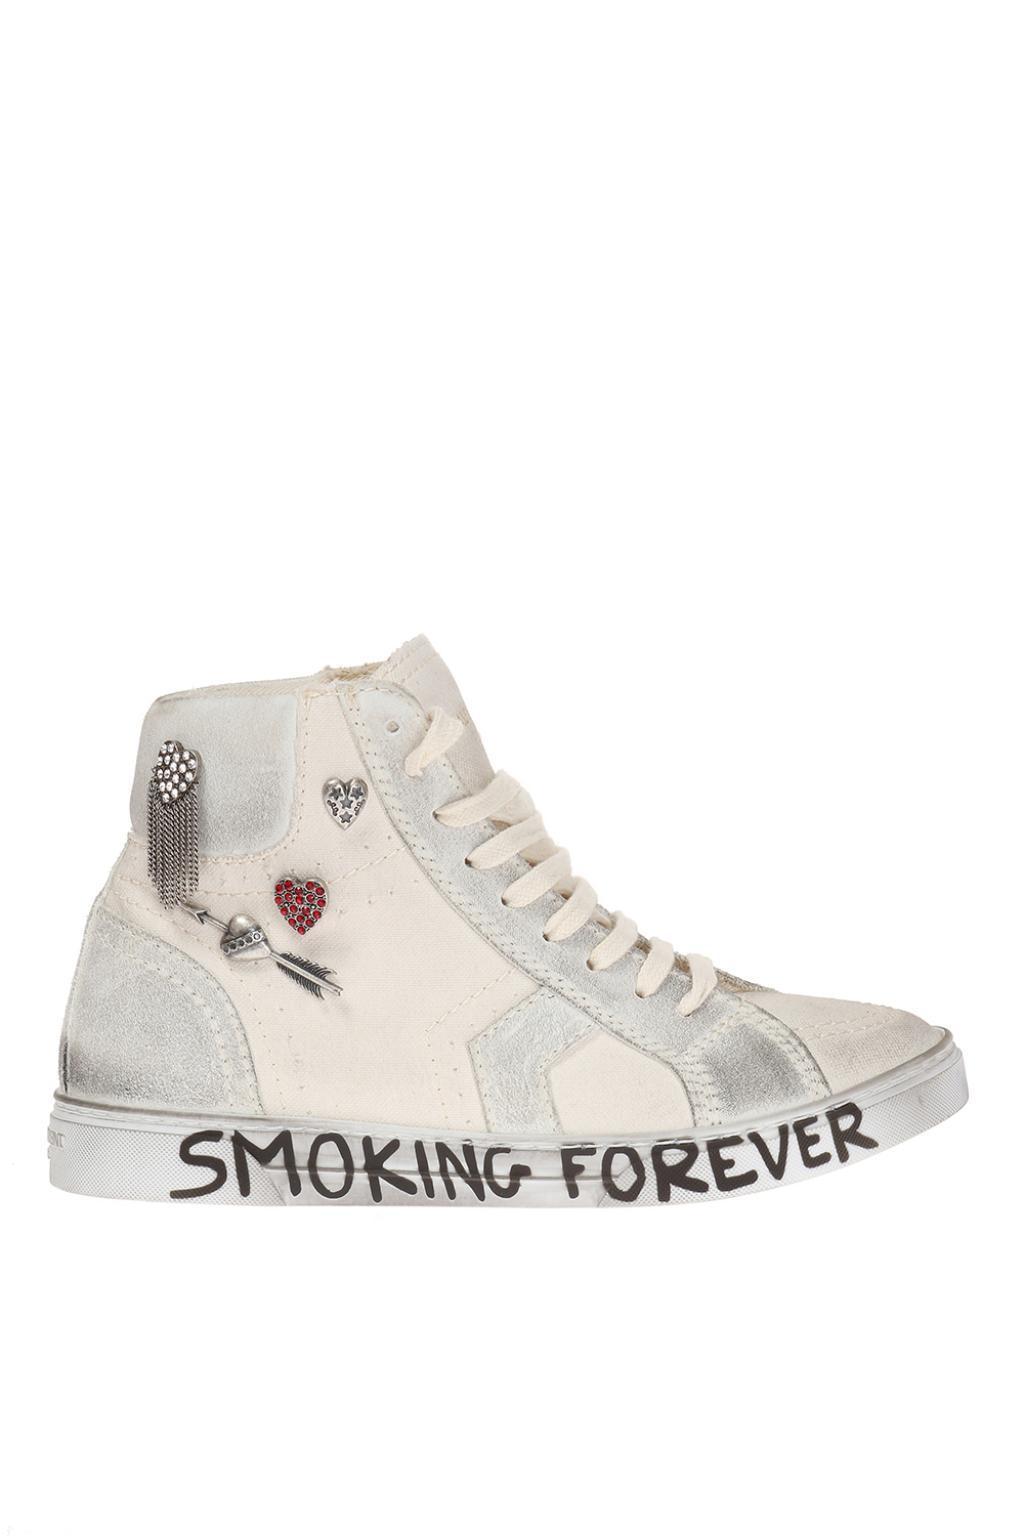 Joe high-top sneakers - White Saint Laurent MYJb9DfW